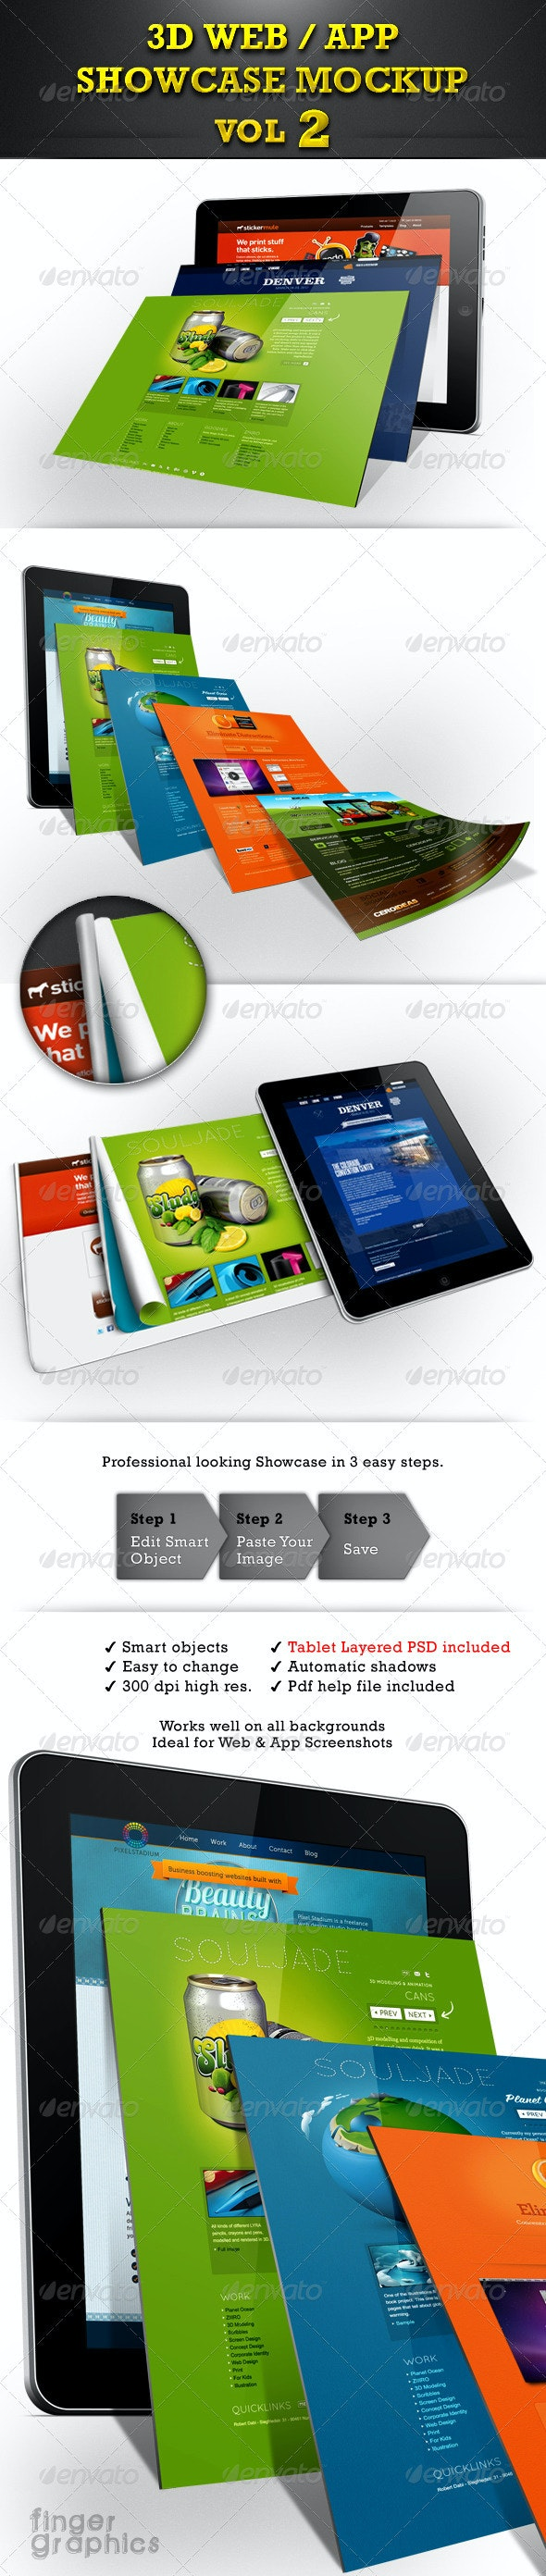 Web / App Showcase Mockup Vol 2 - Mobile Displays